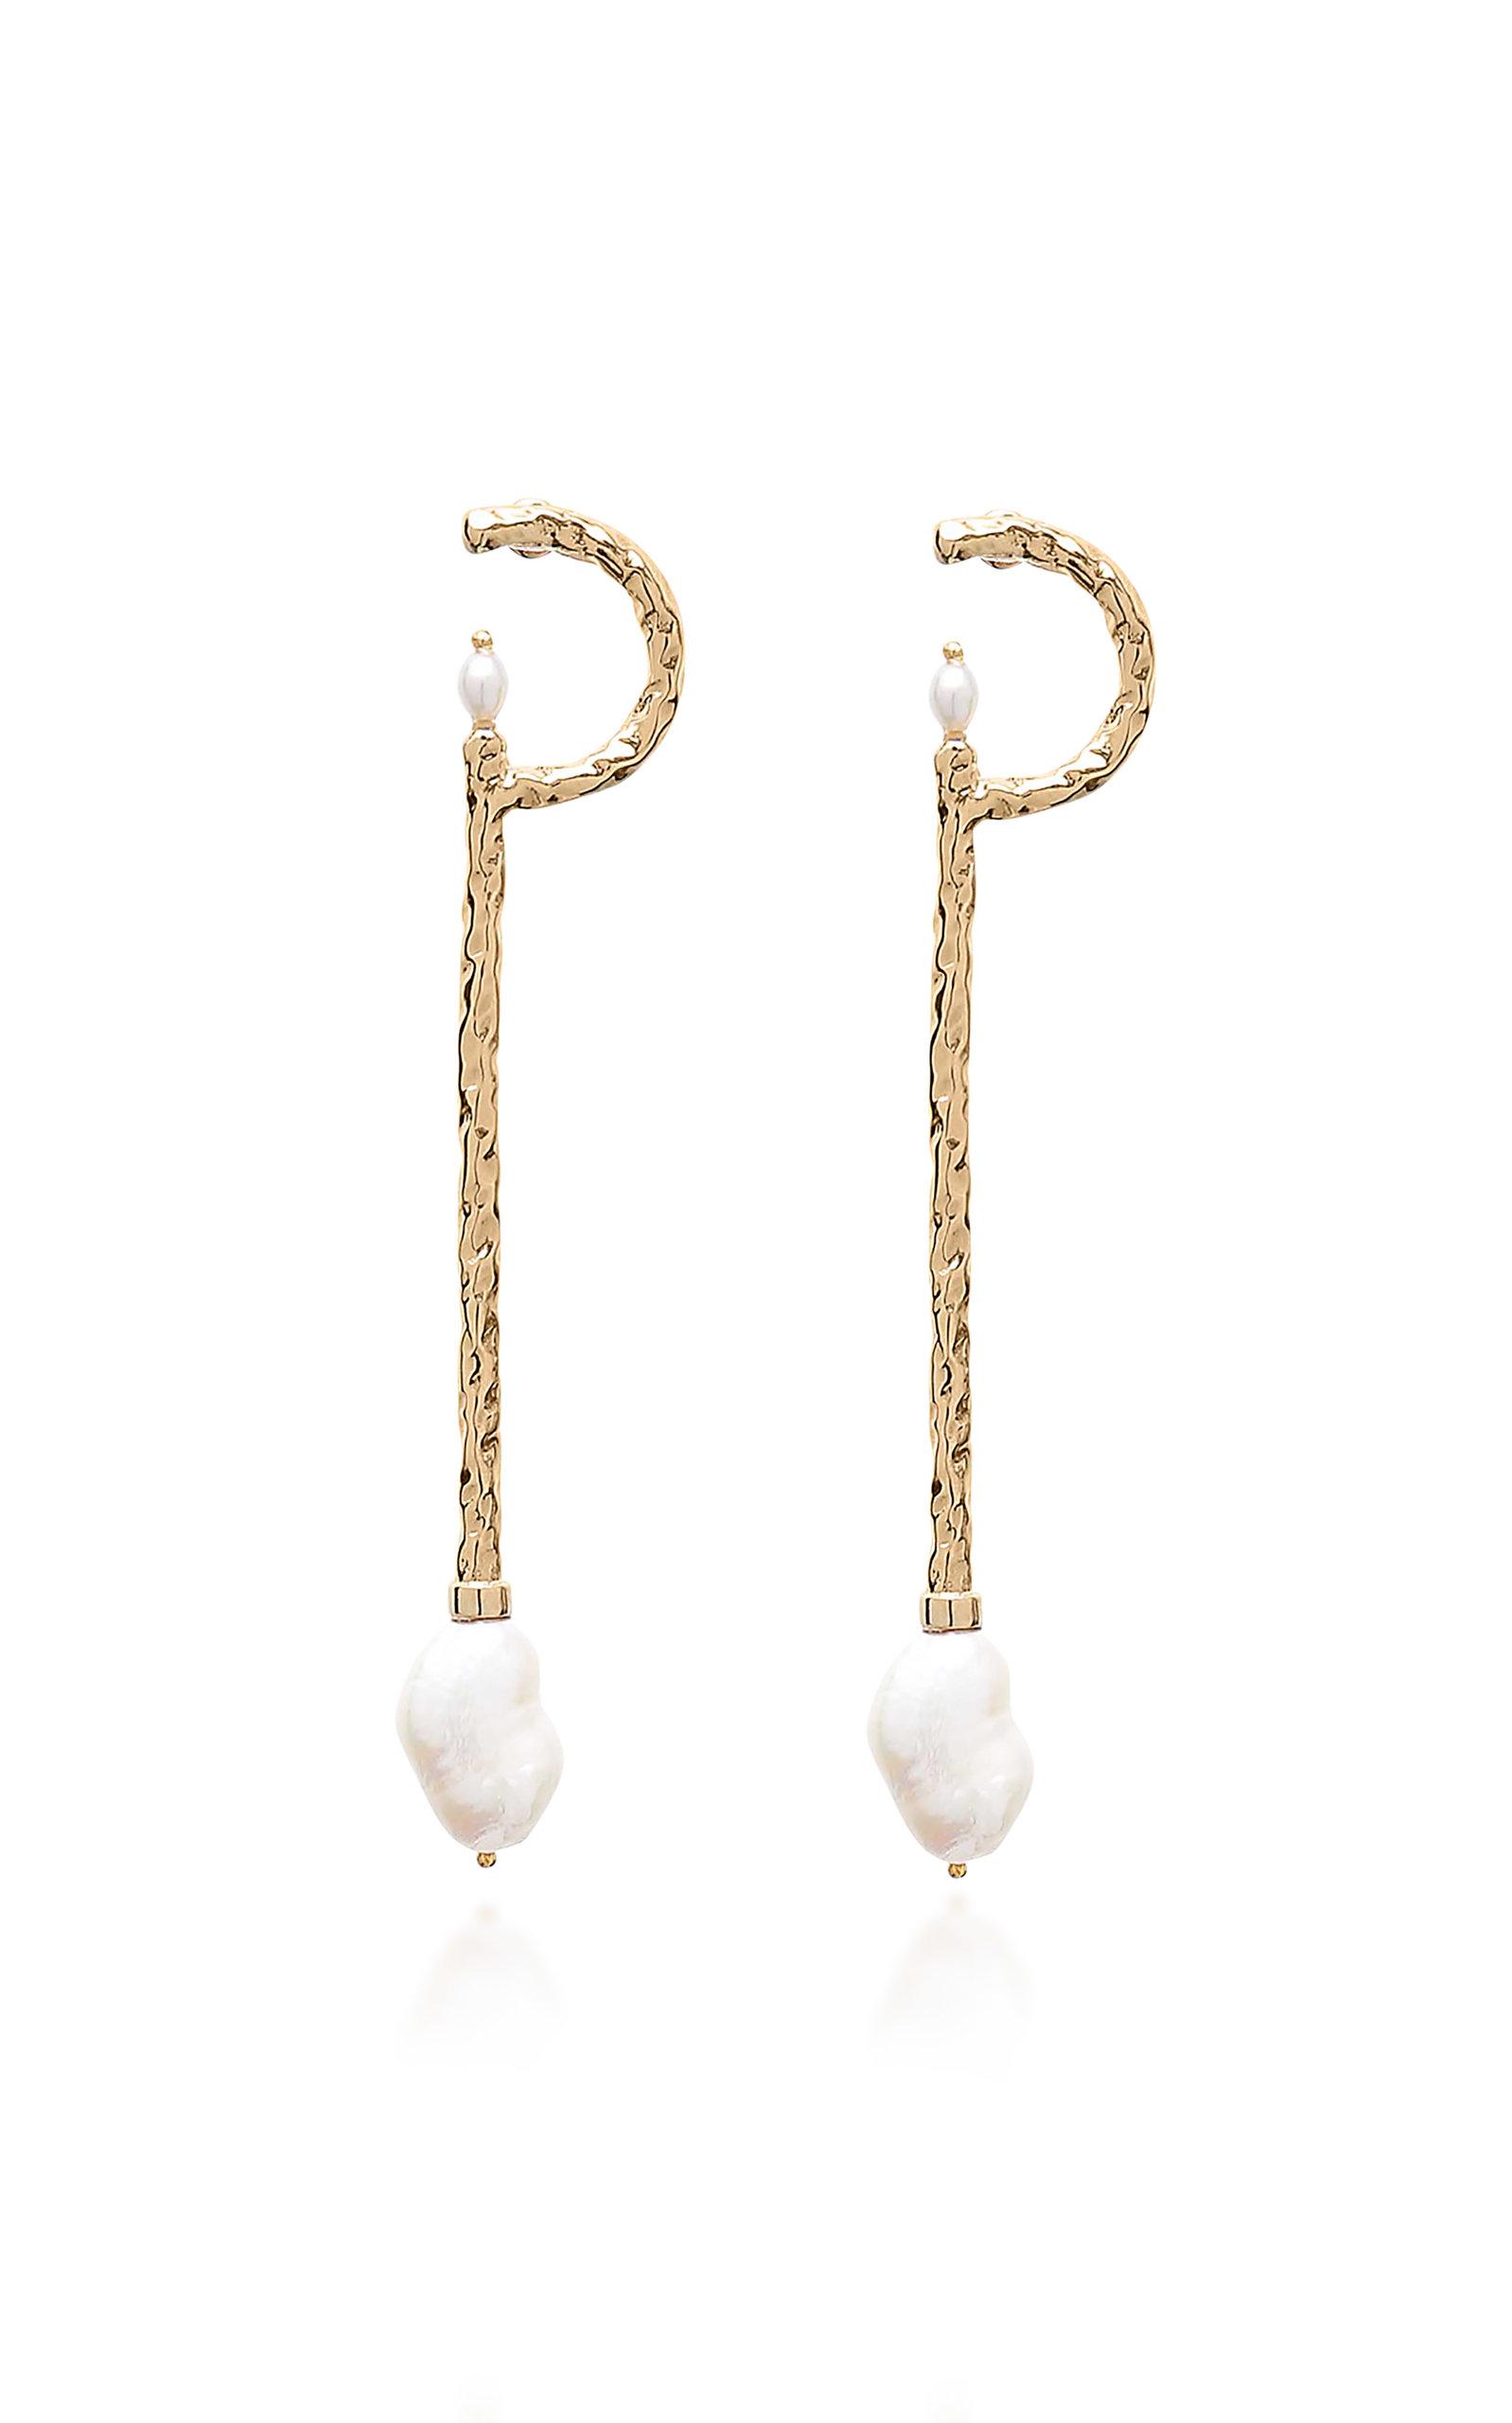 ALICAN ICOZ X ATTICO Girls Drop Earrings in Gold